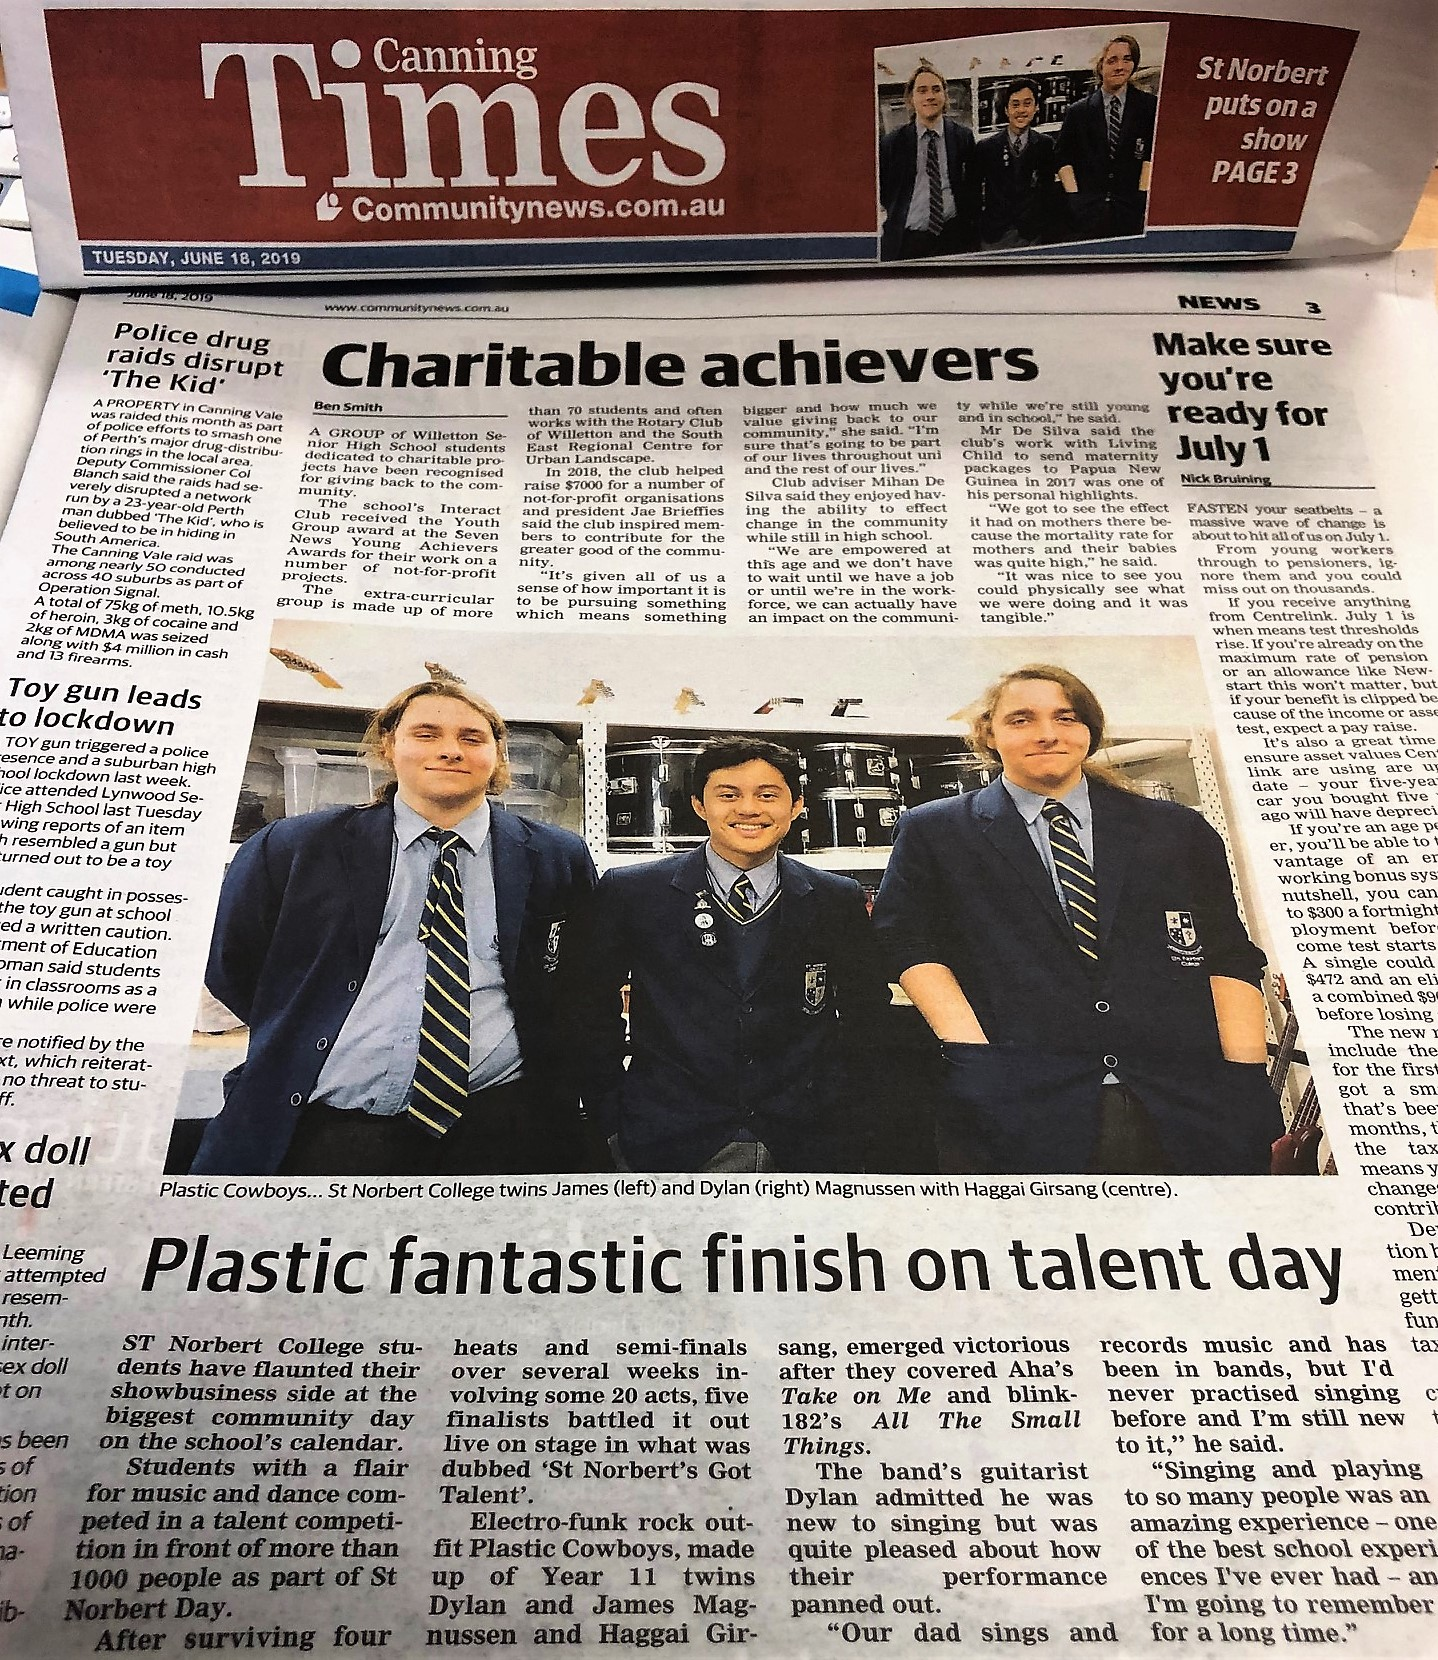 Plastic fantastic finish on talent day